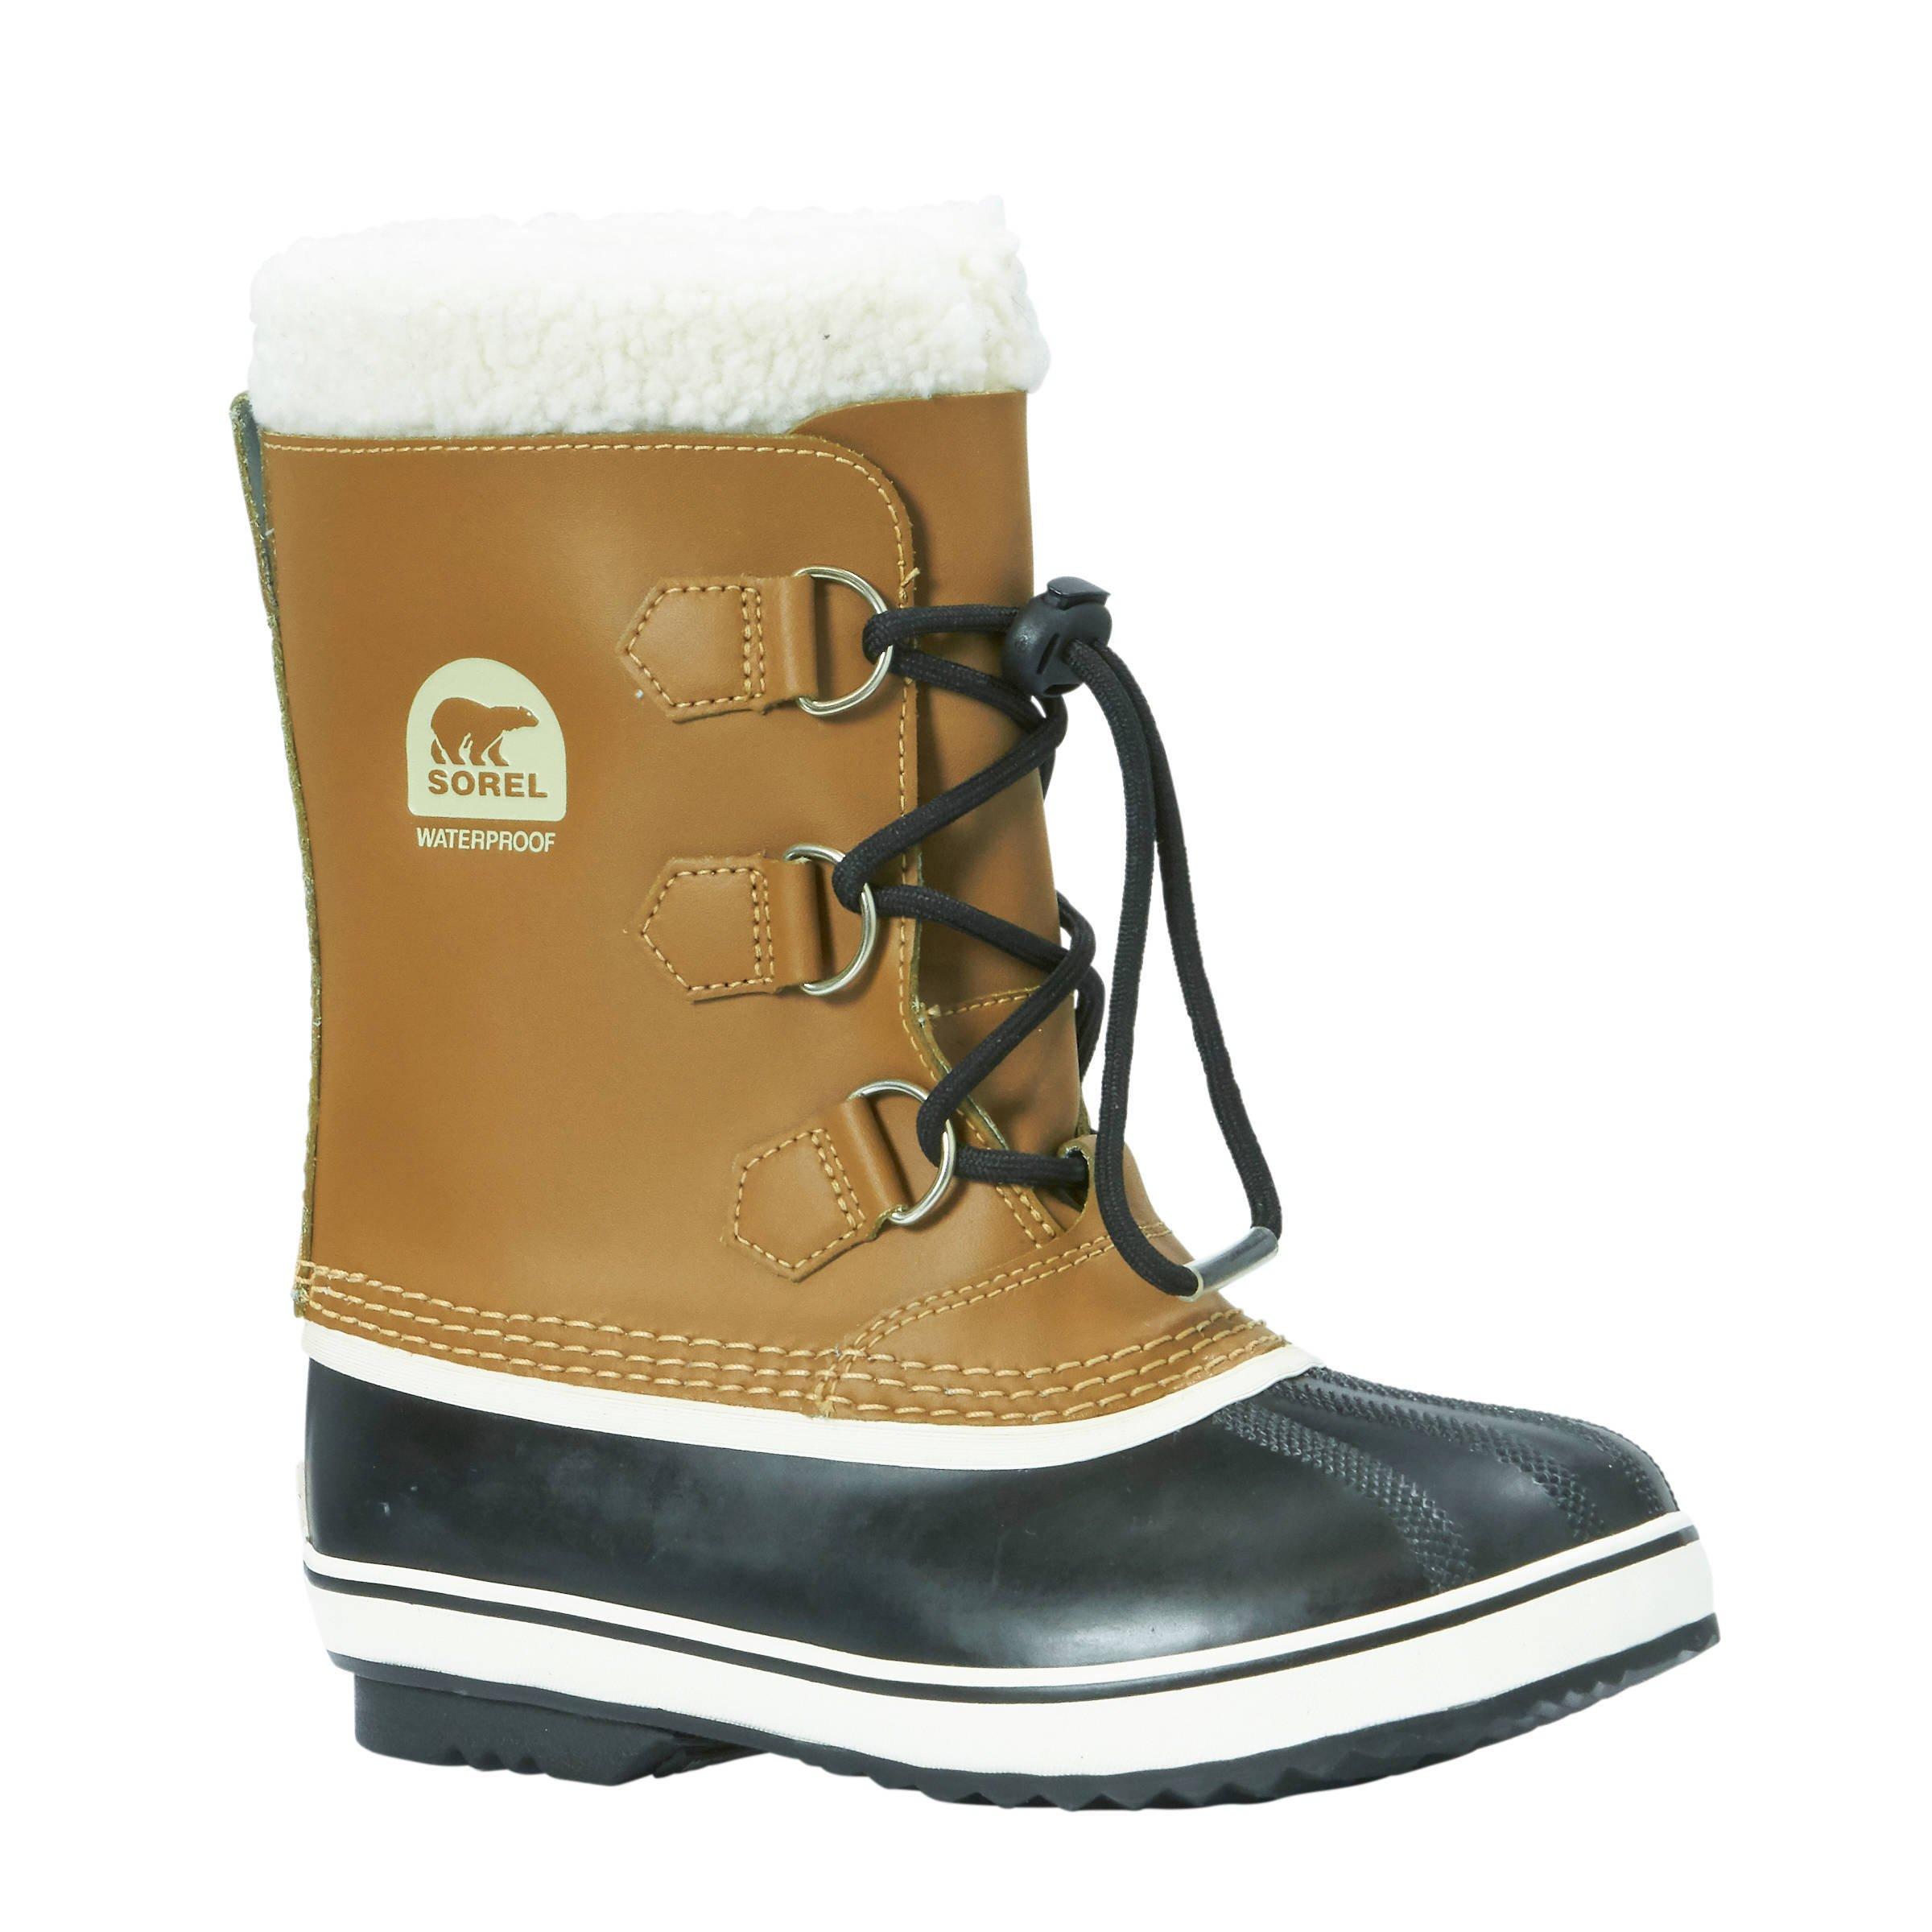 a7ae061f058cc sorel-yoot-pac-nylon-snowboots-bruin-bruin-0888664577980.jpg